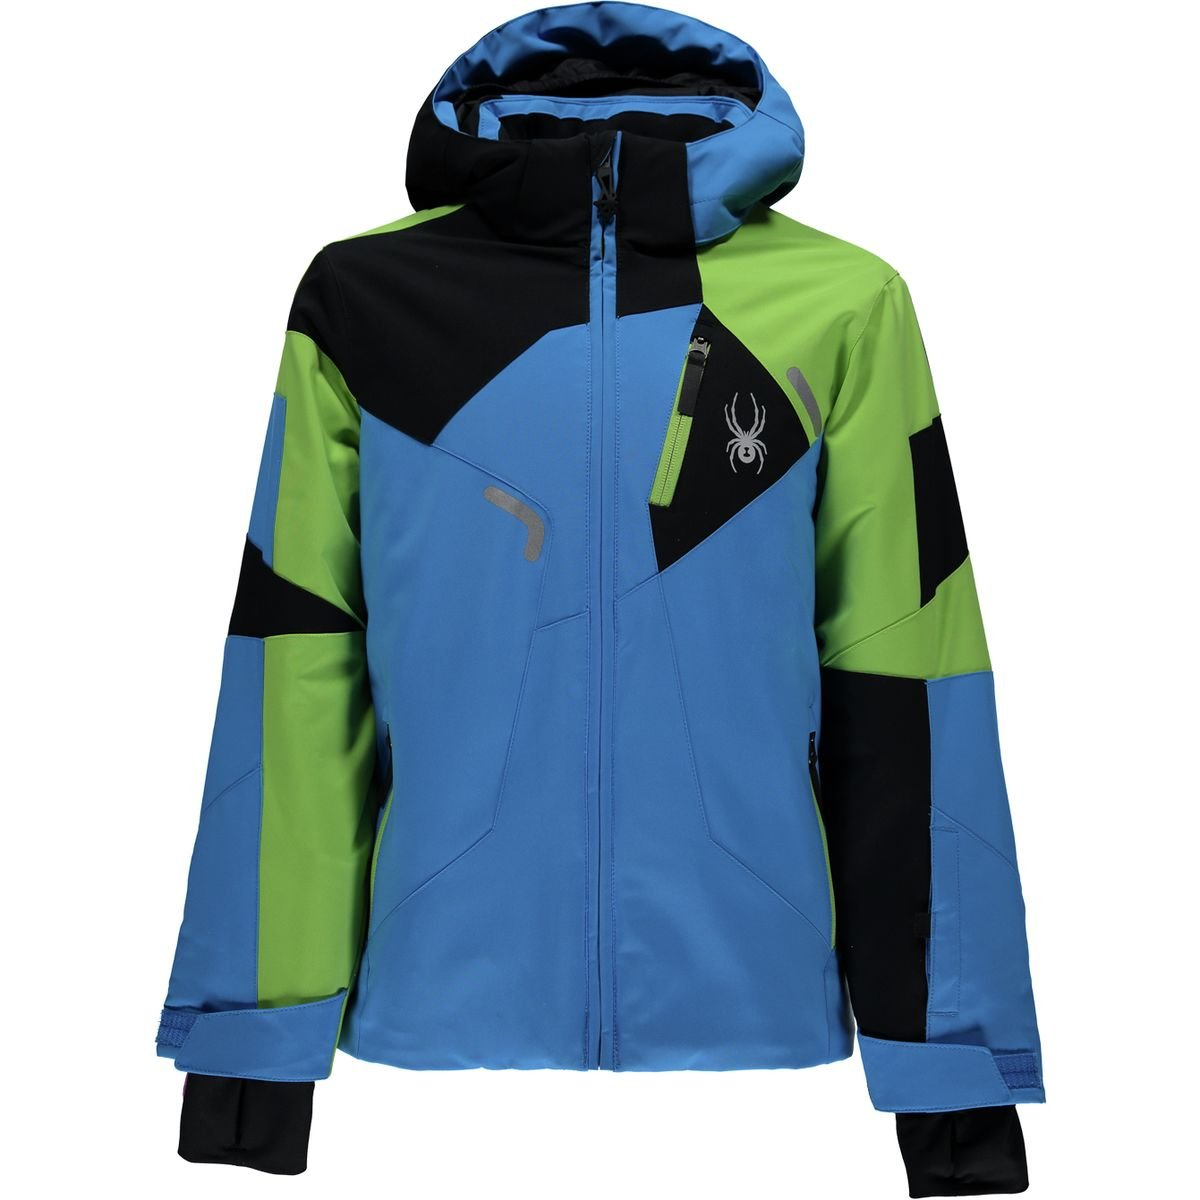 Spyder Kids  Boy's Leader Jacket (Big Kids) Fresh Blue/Fresh/Black 12 by Spyder